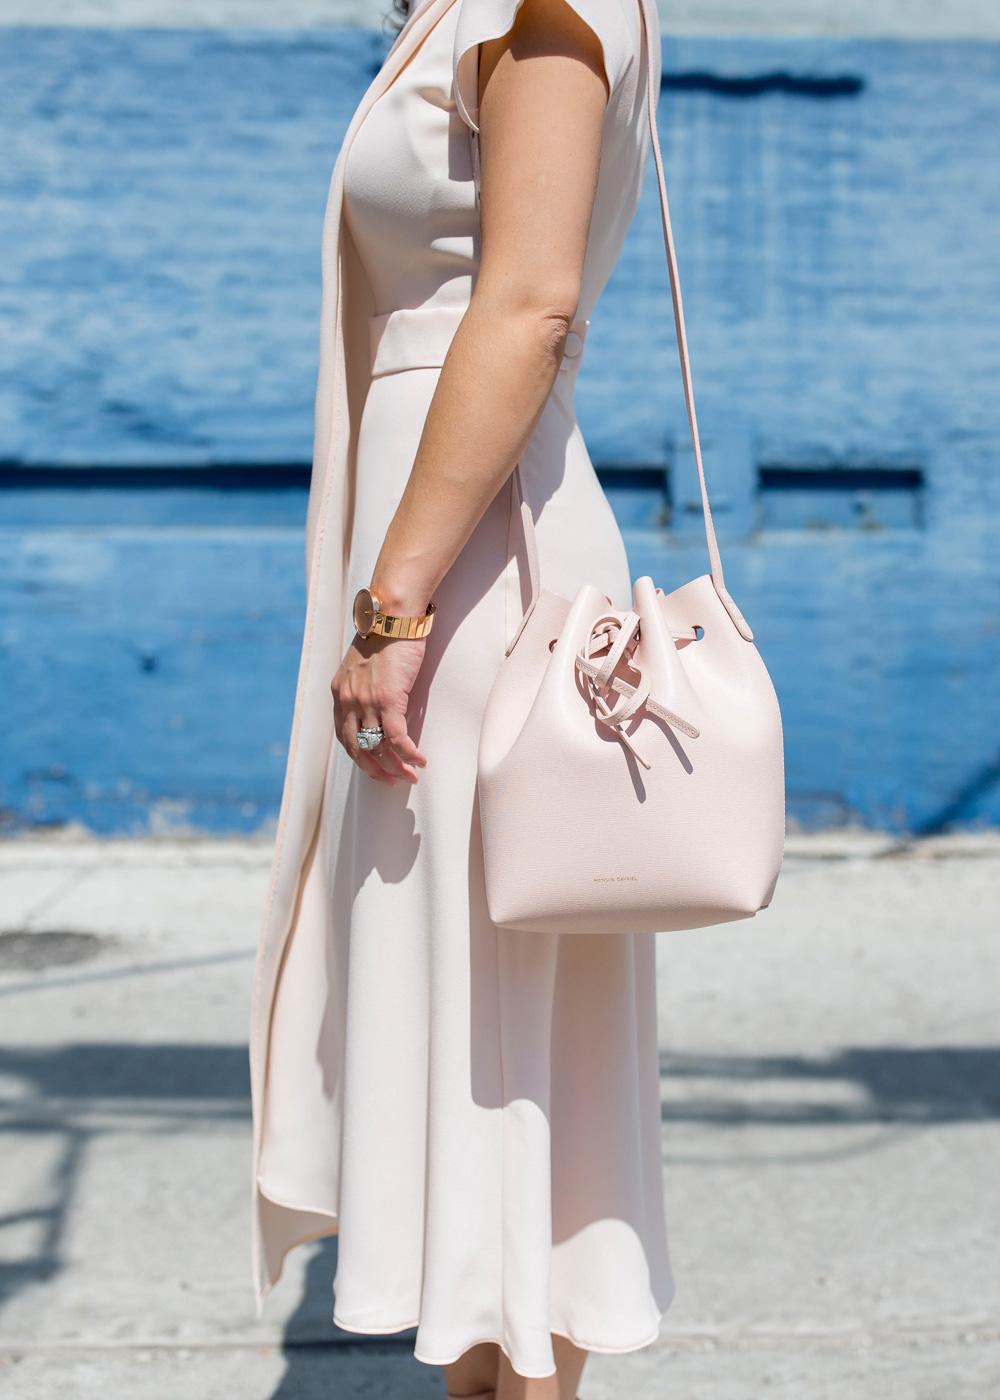 Mansur Gavriel Pink Mini Bucket Bag